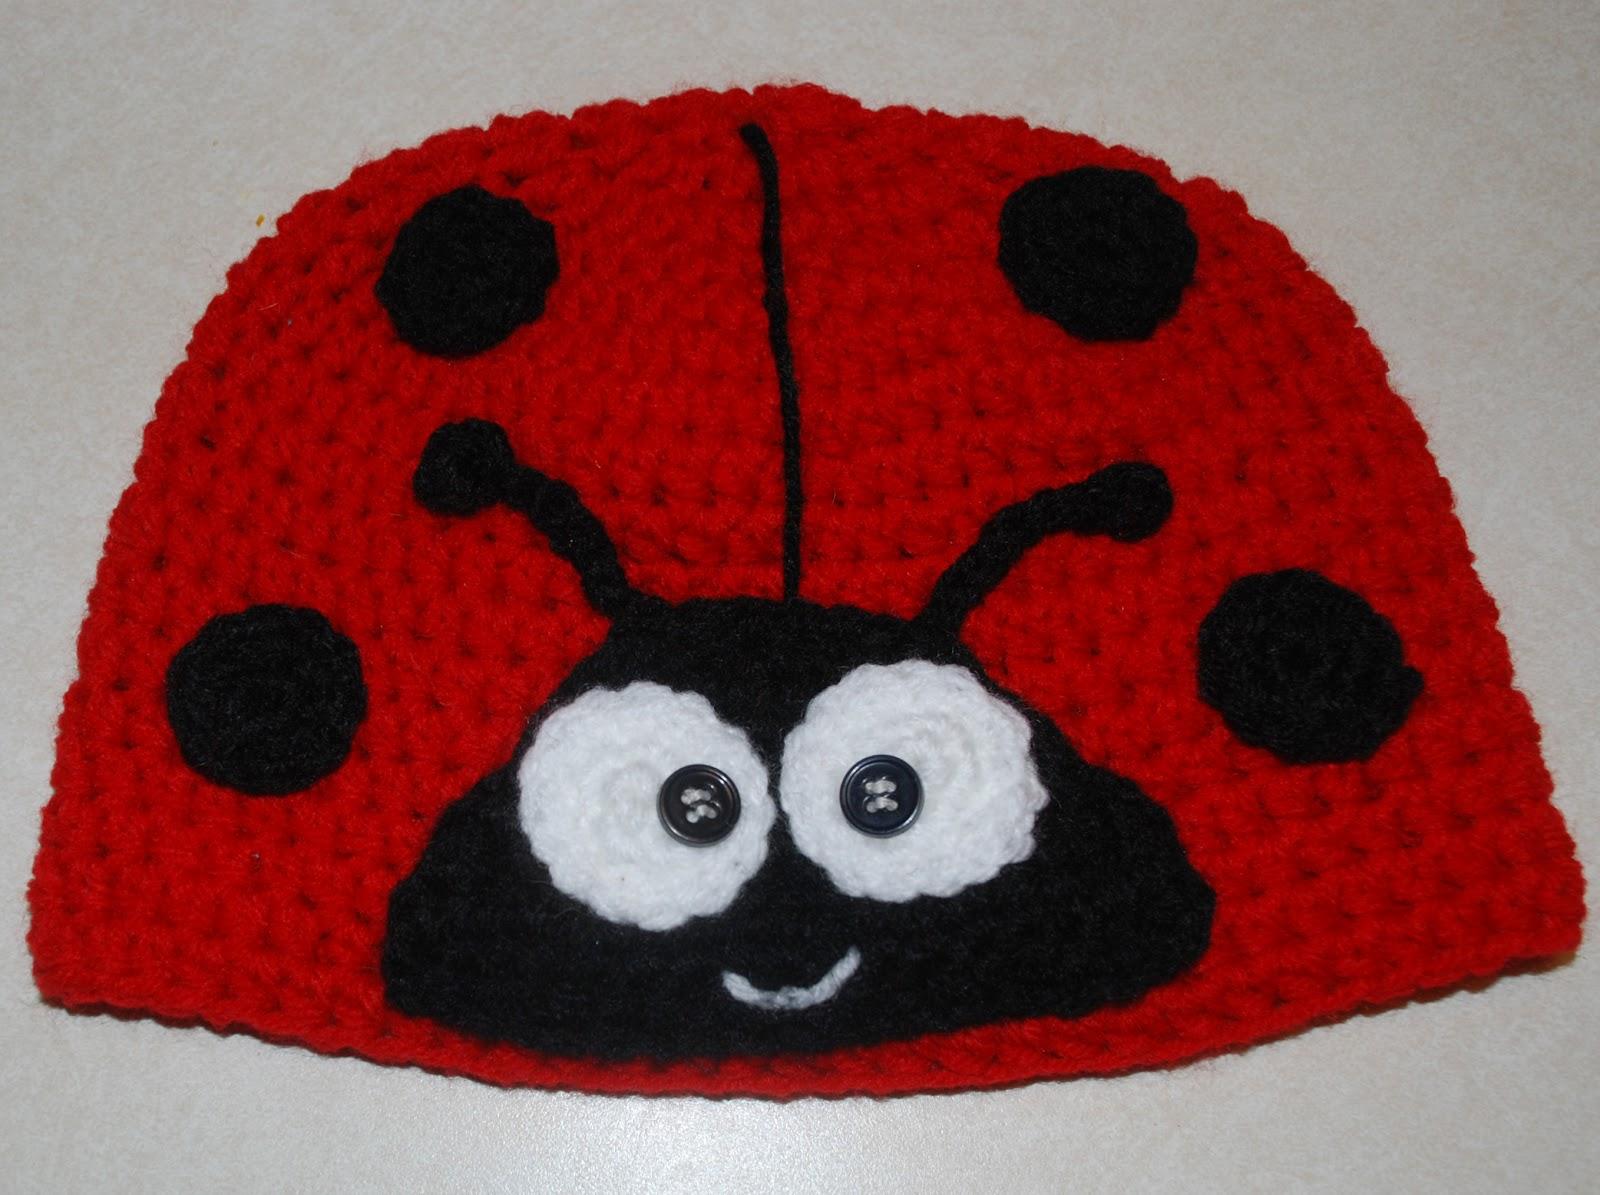 Ladybug hat crochet pattern crafthubs crochet ladybug hat bankloansurffo Choice Image